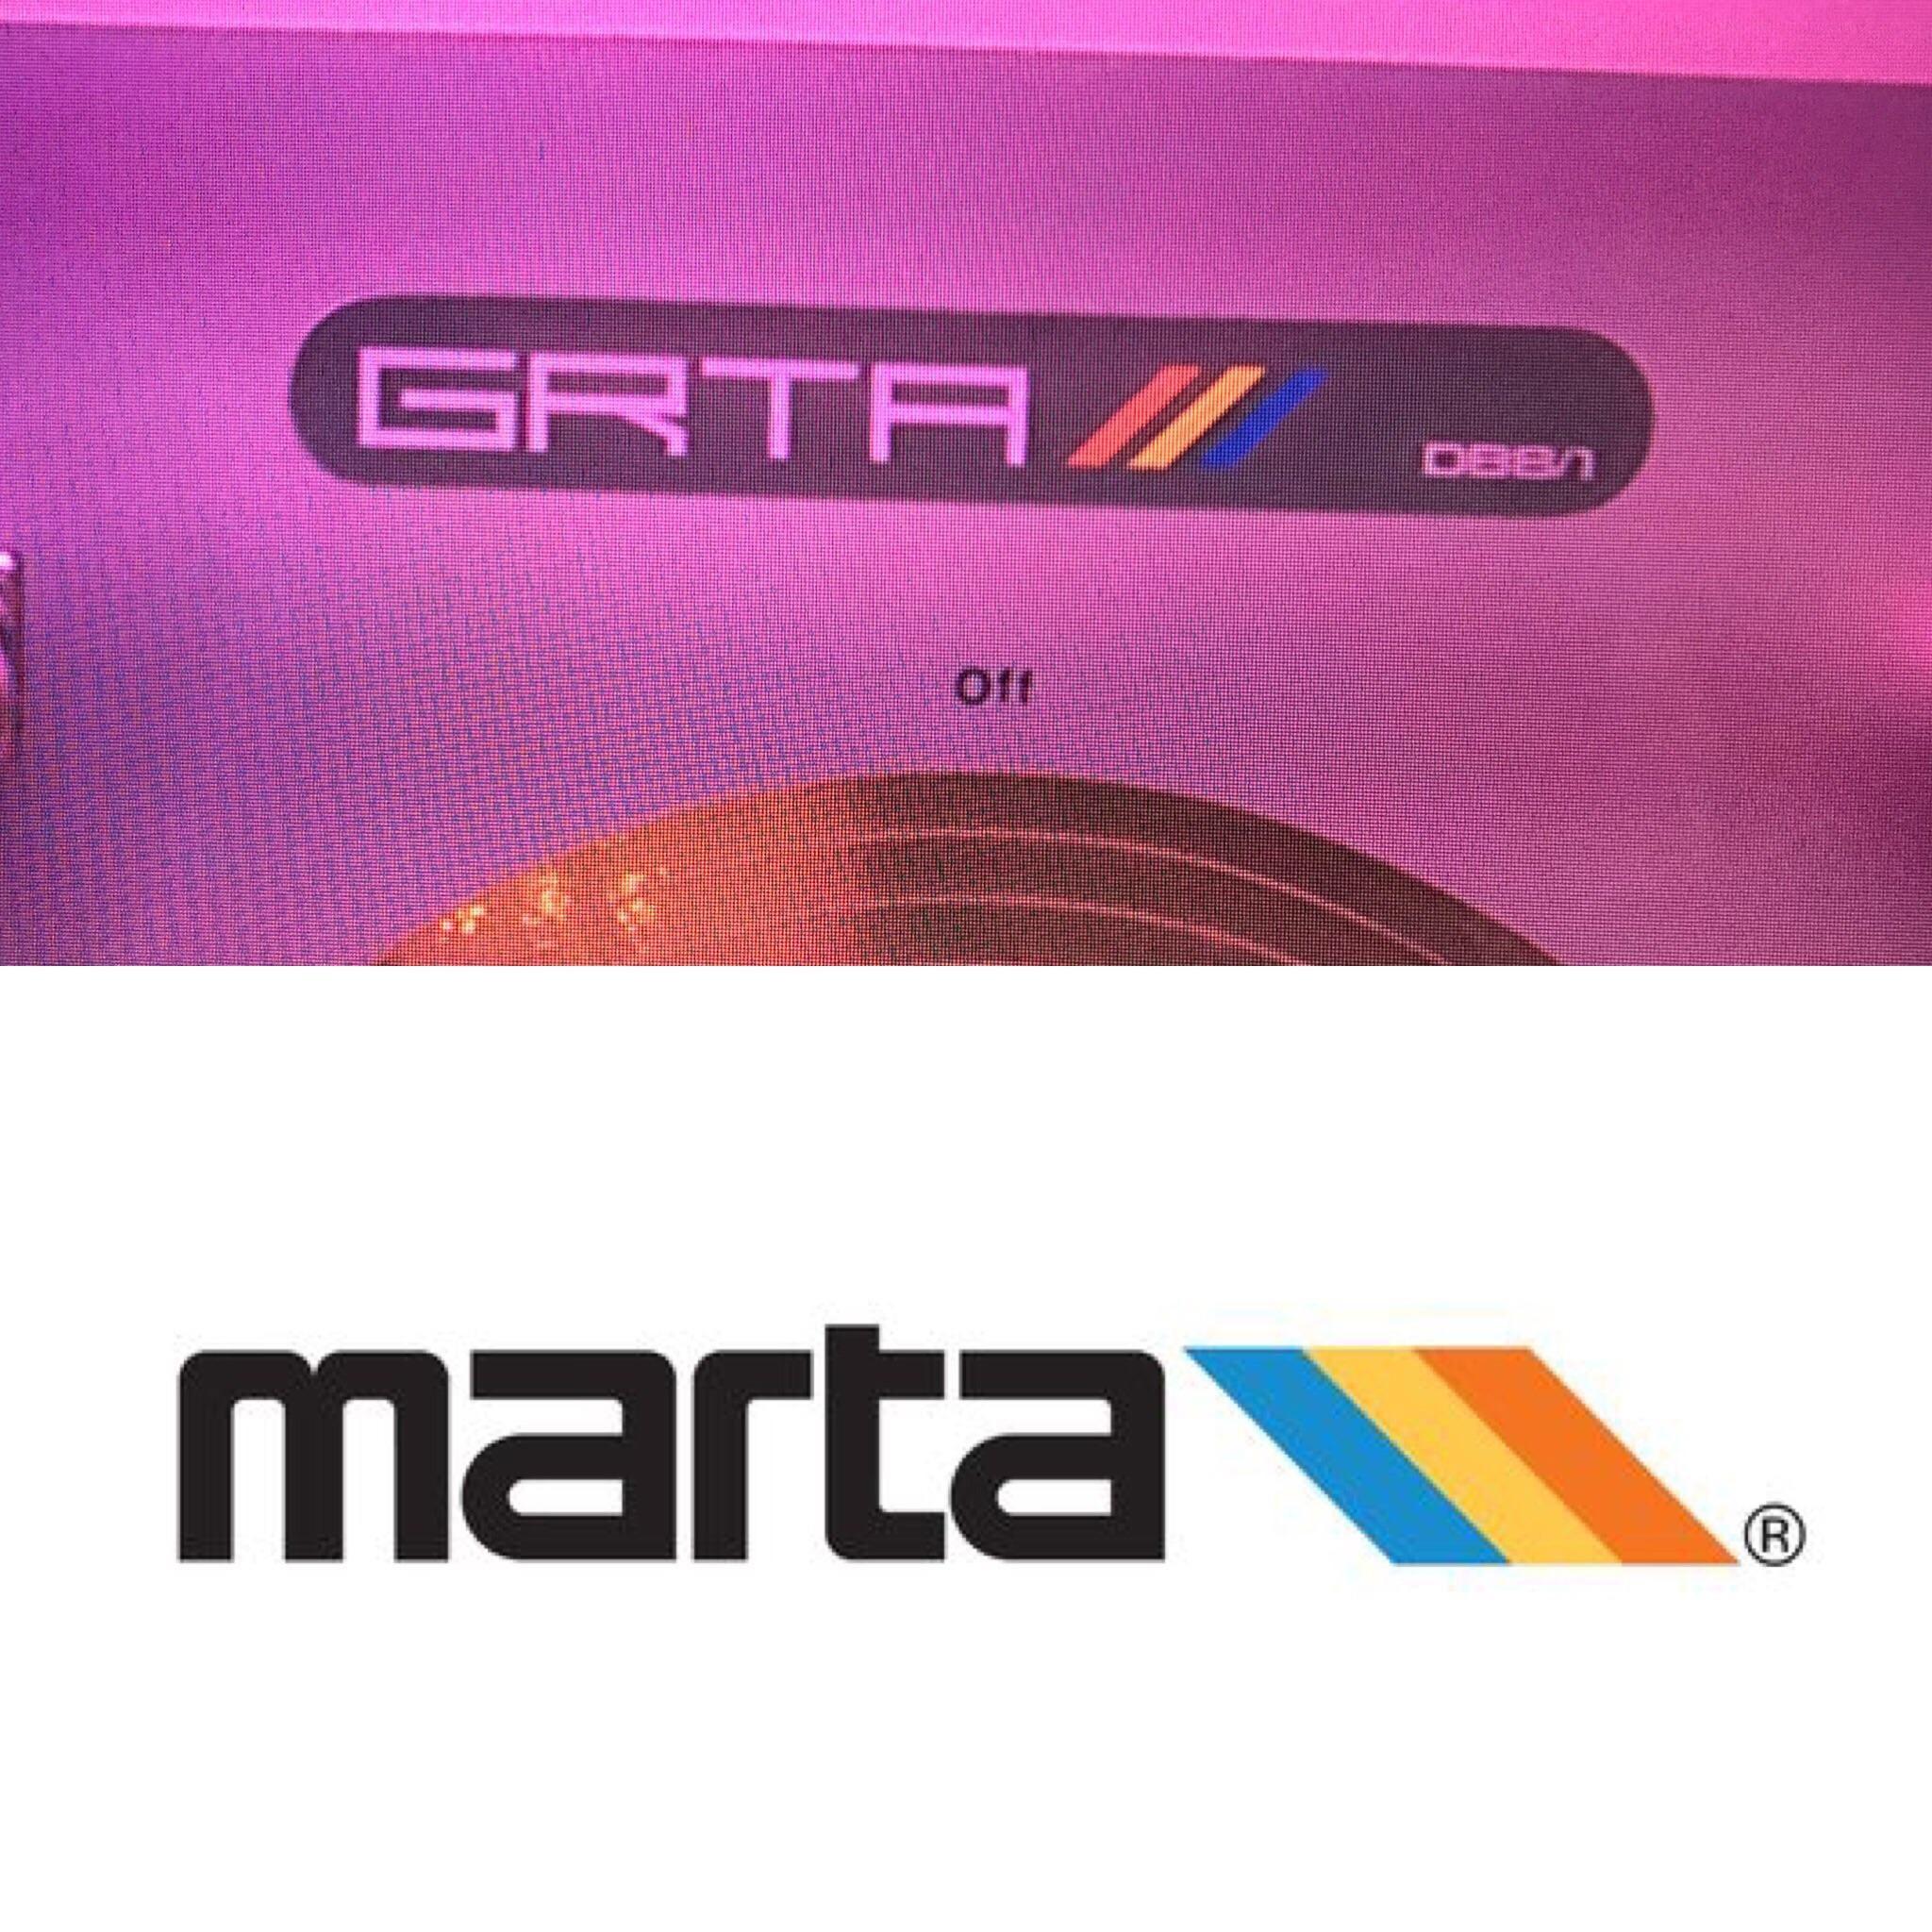 Noticed this MARTAesque logo in Maniac on Netflix